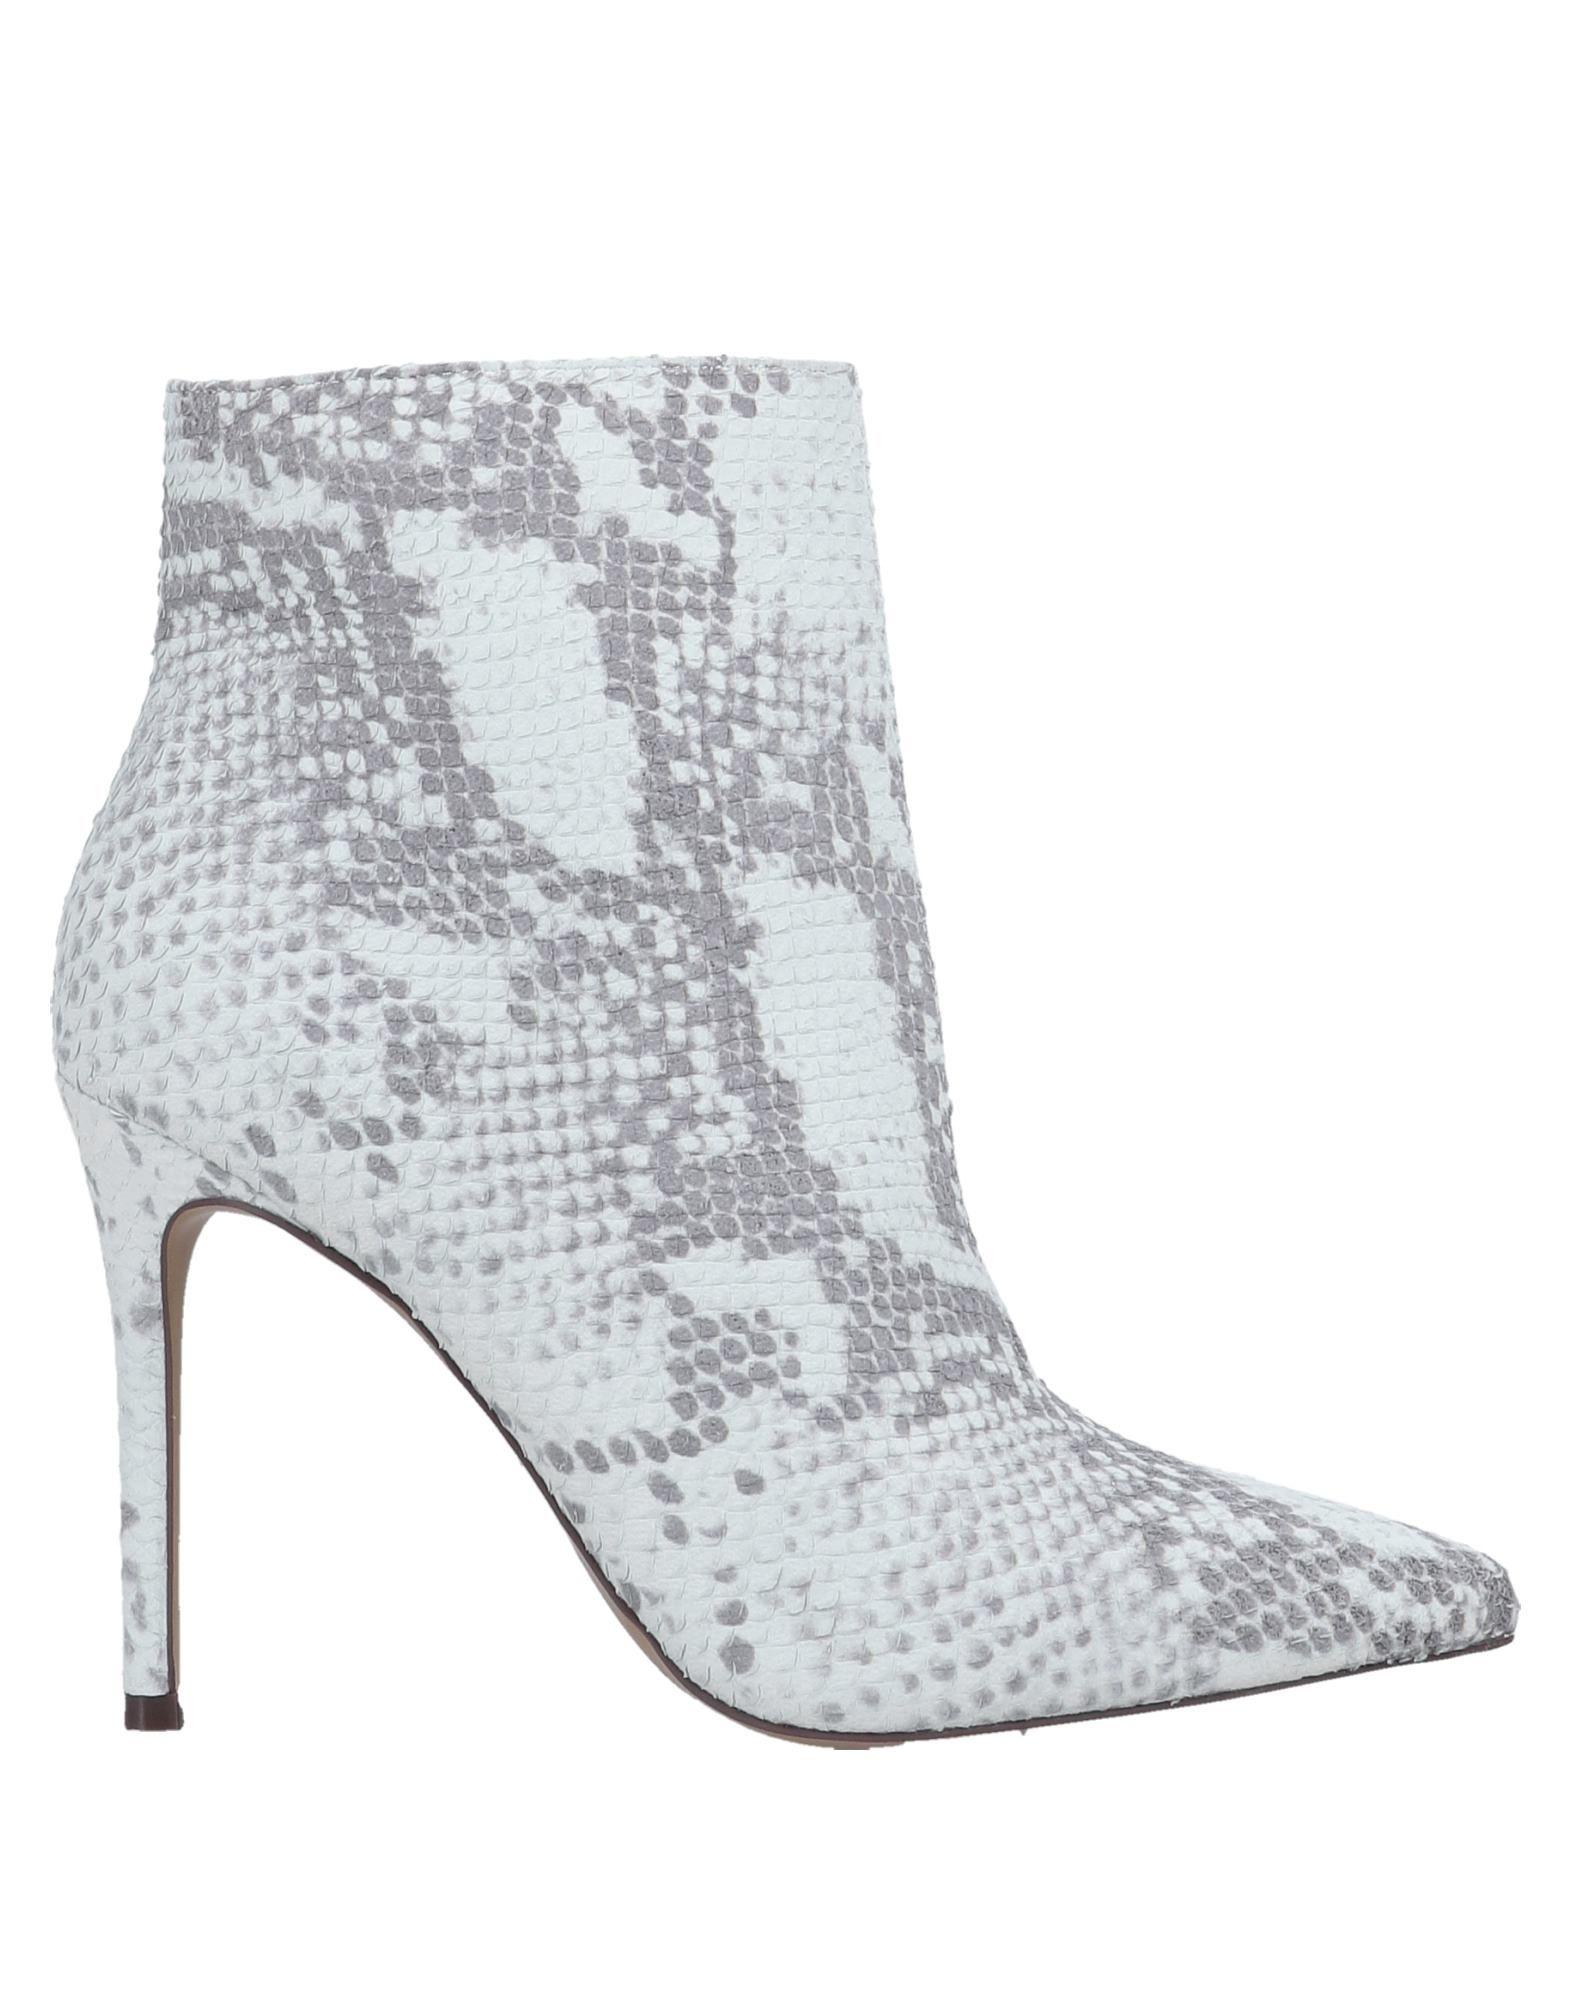 Bottine Windsor Smith Femme - Bottines Windsor Smith Gris clair Chaussures femme pas cher homme et femme